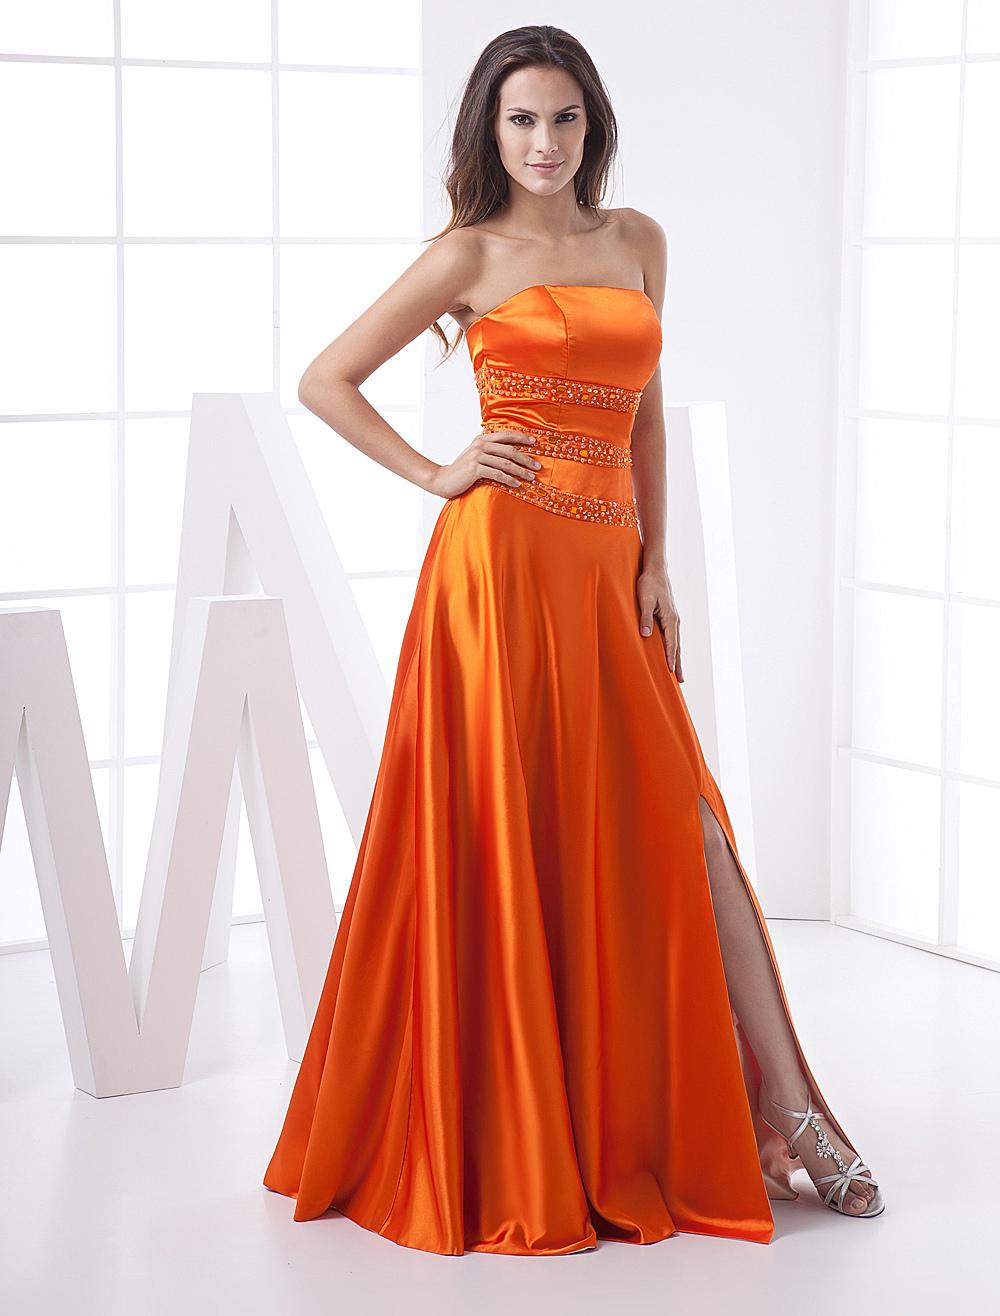 Long Prom Dresses Orange Red Strapless Formal Evening